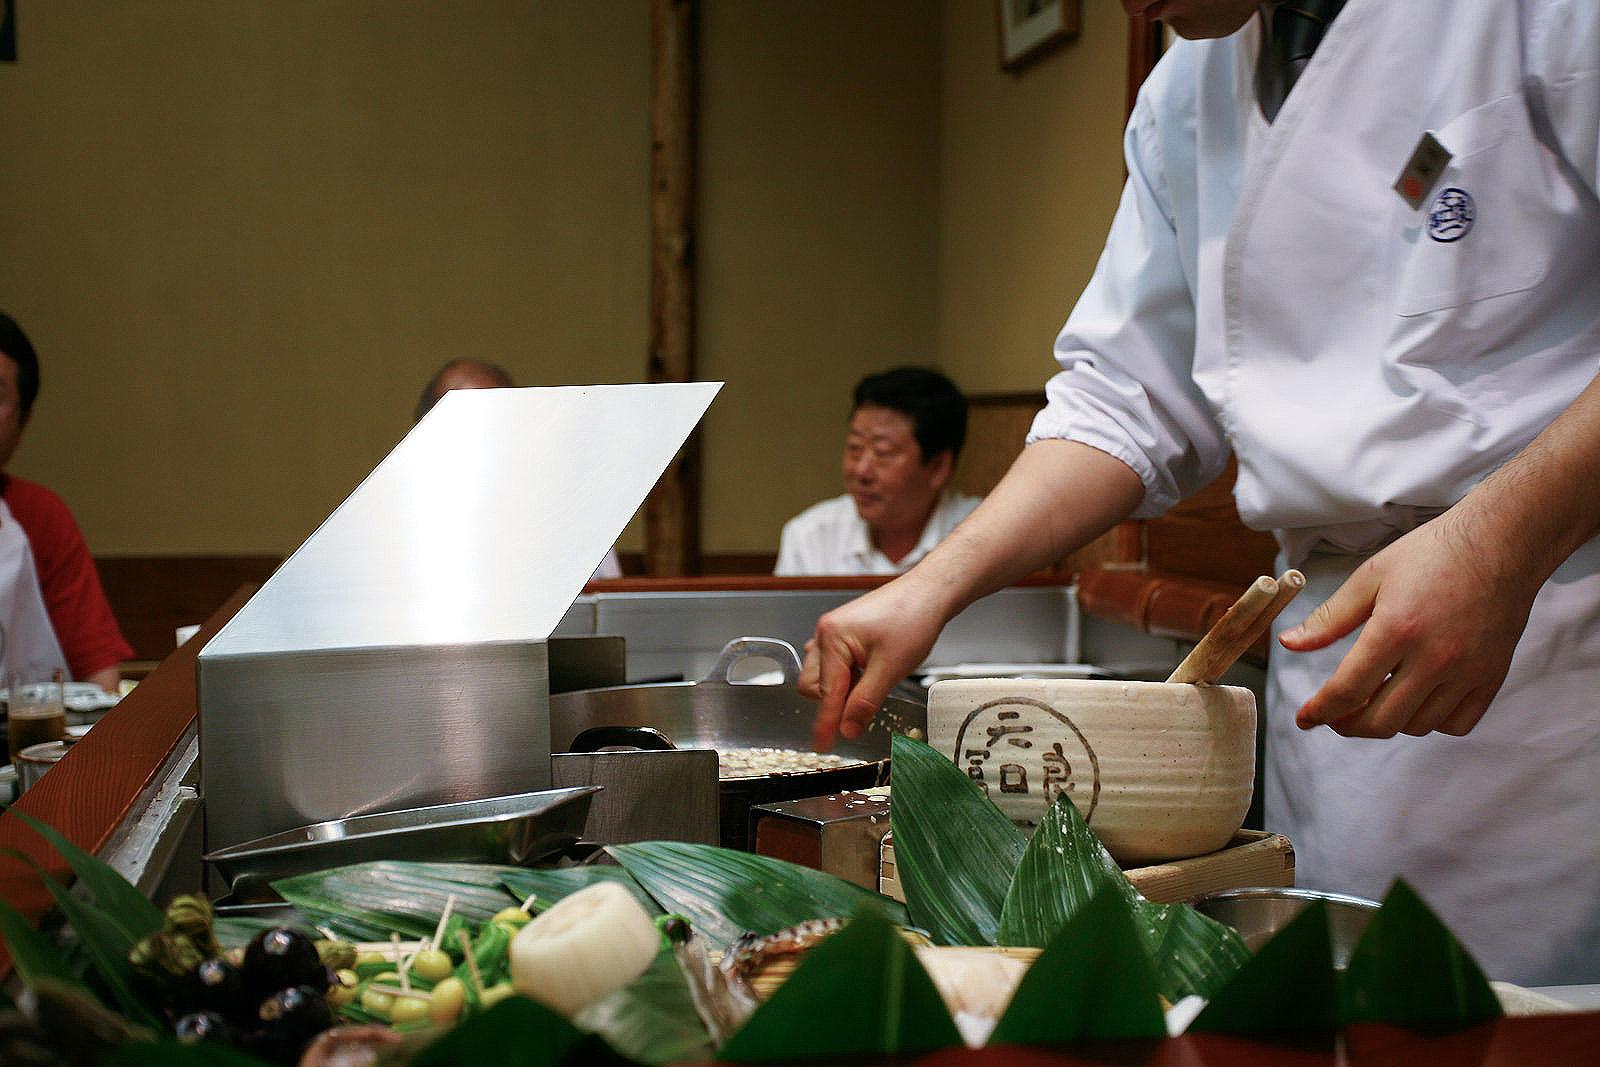 Tenichi, Ginza, Tokyo - Chef fries each piece individually